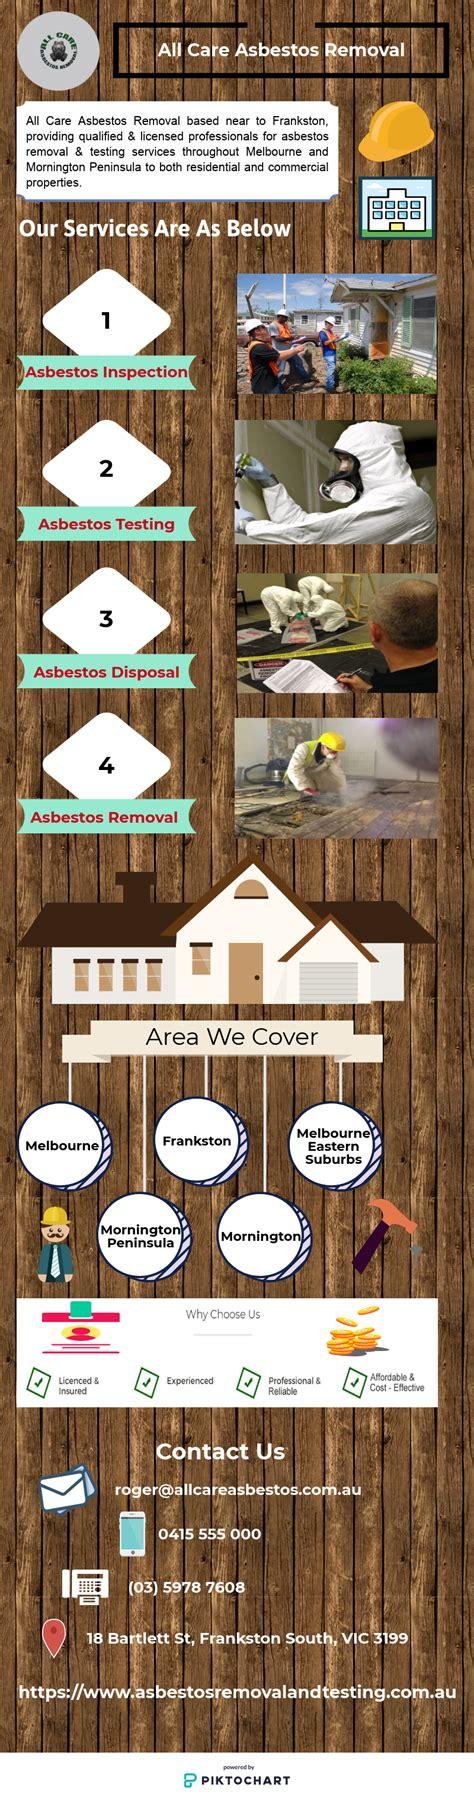 contact  care asbestos removal   kind  asbestos